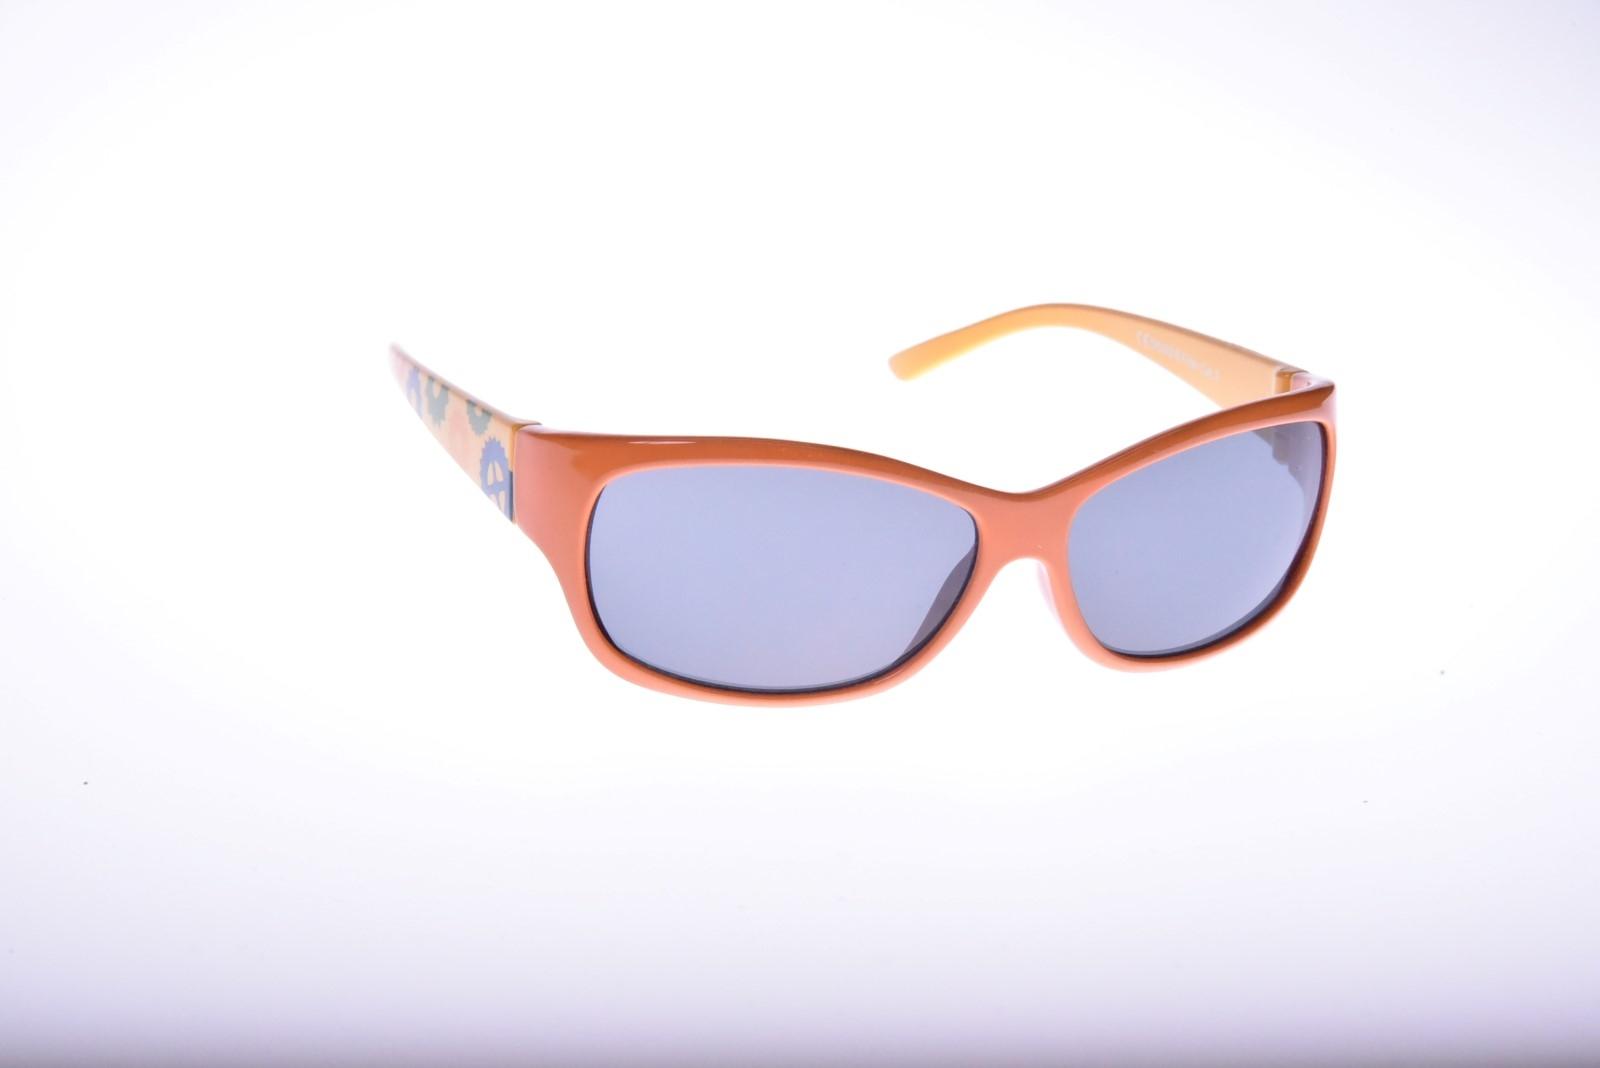 Polaroid Disney D6302B - Slnečné okuliare pre deti 4-7 r.